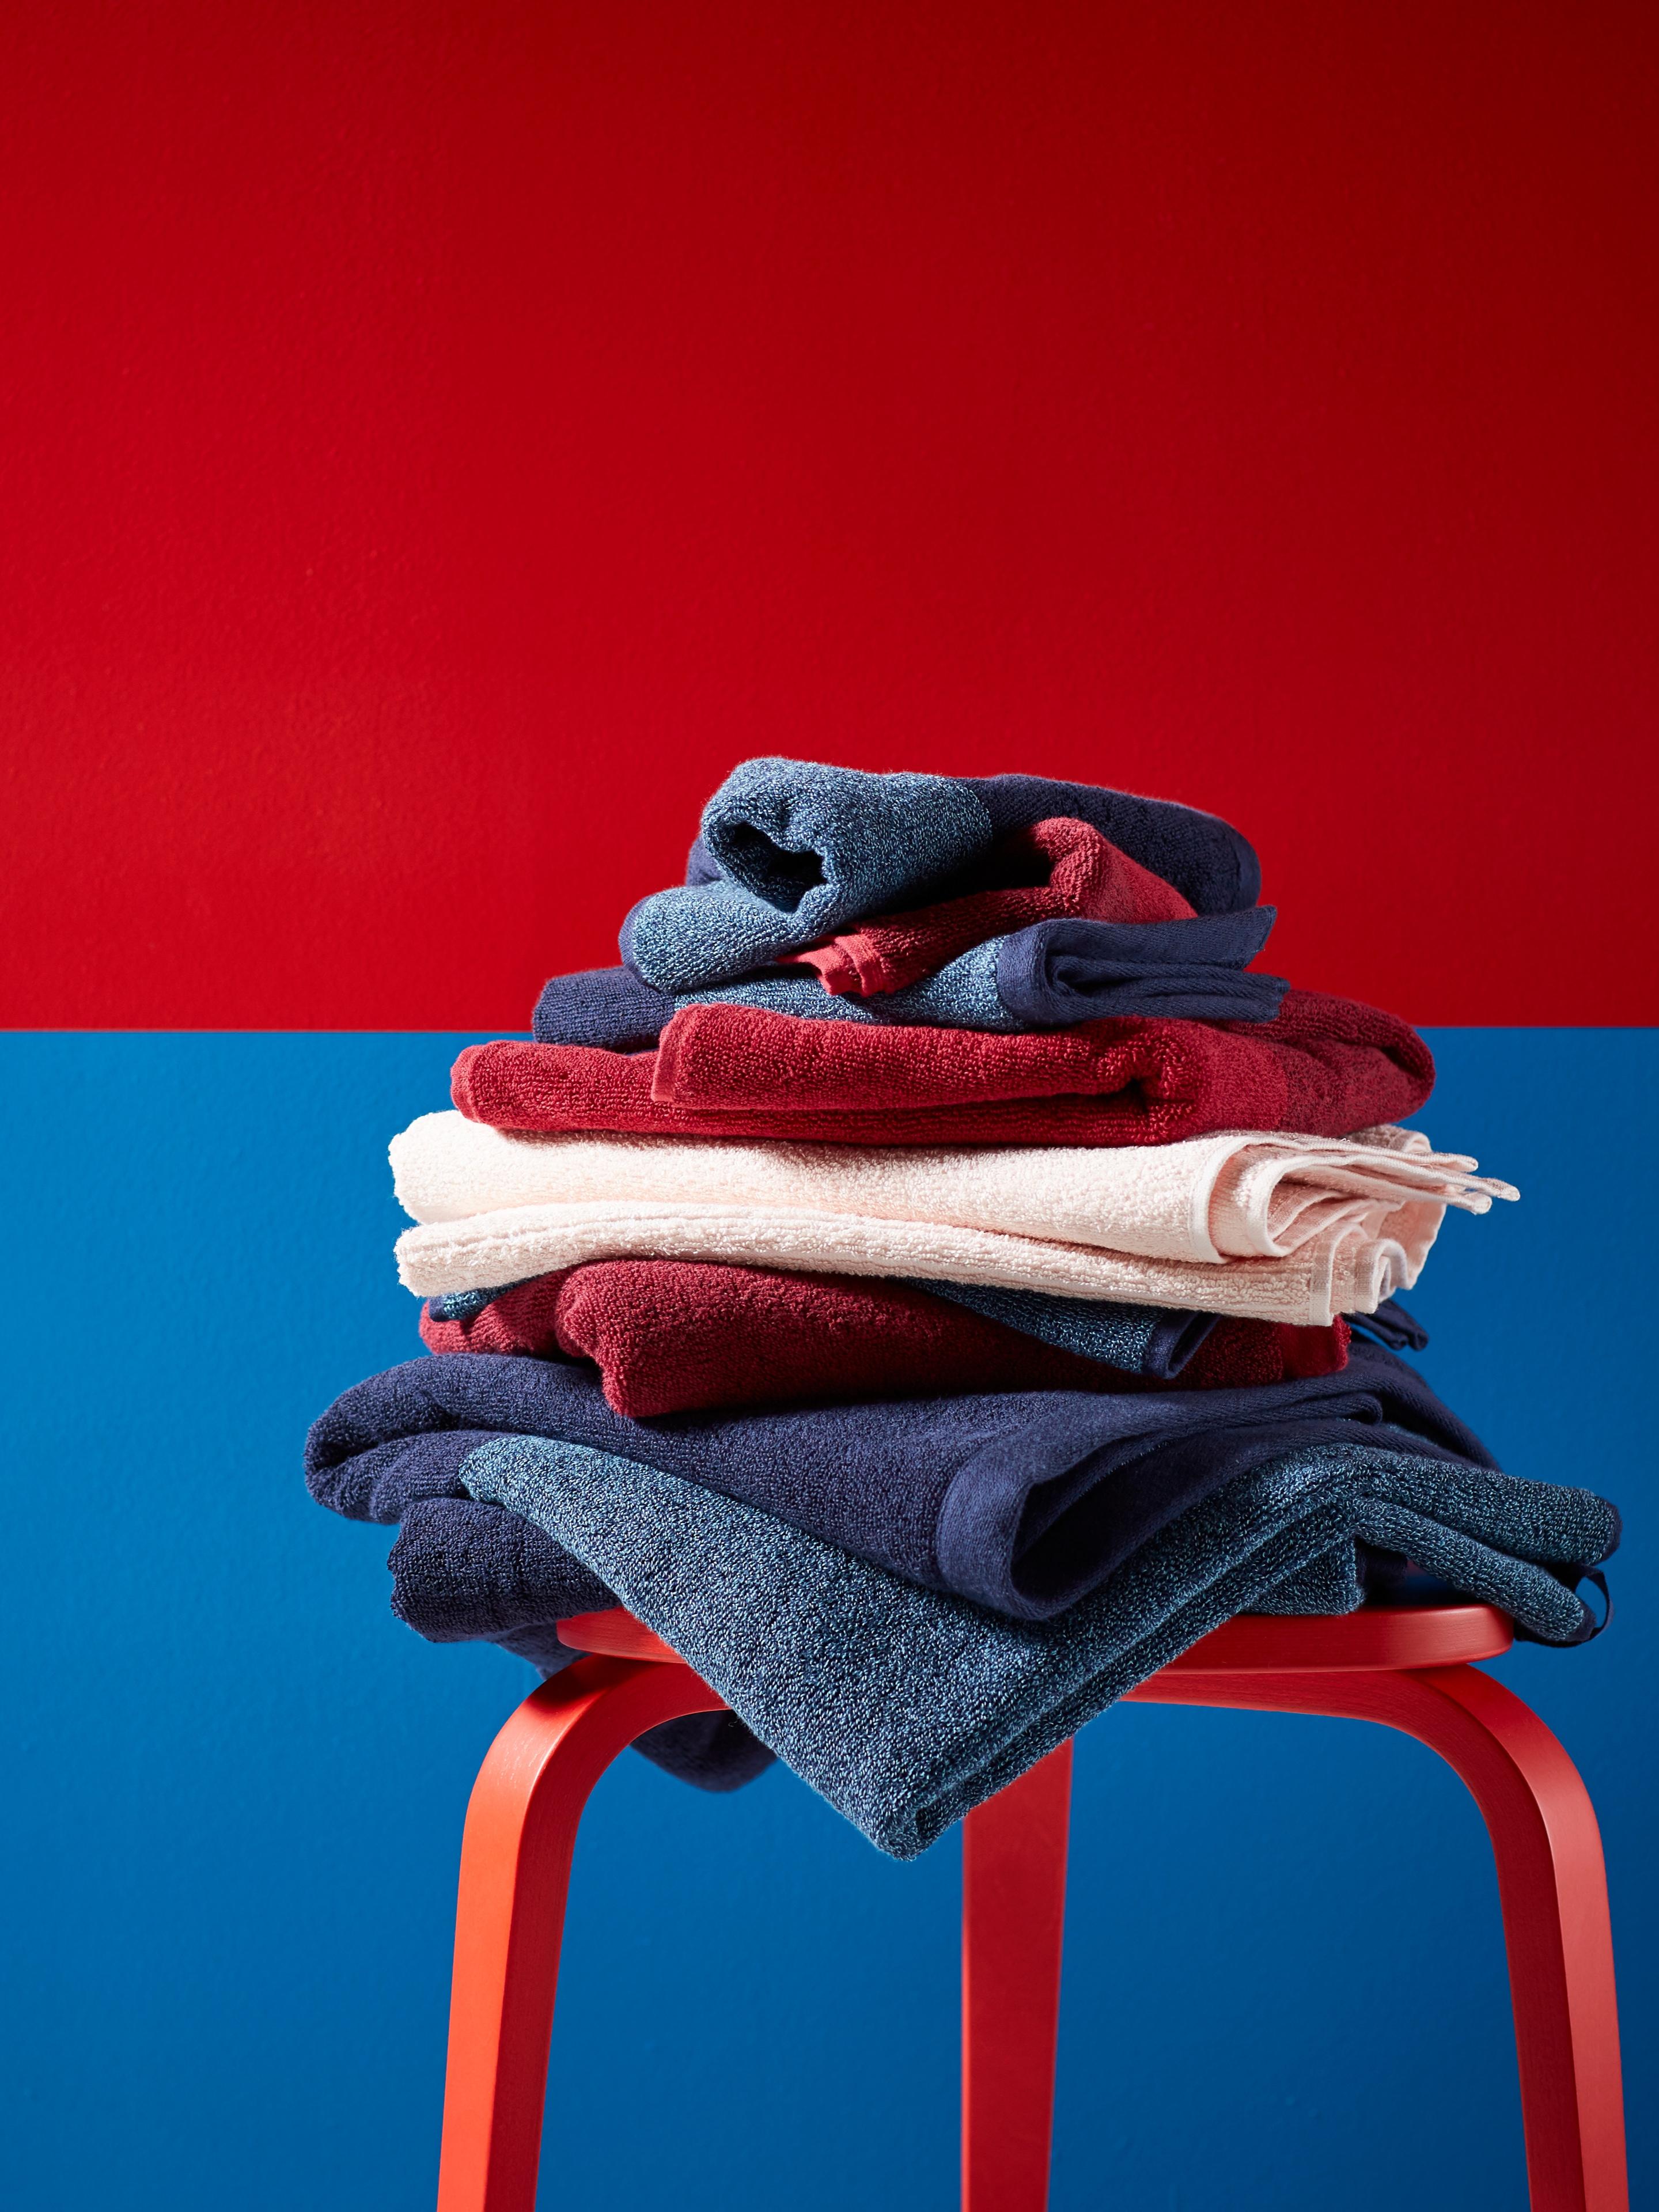 Izbor HIMLEÅN ručnika različitih boja, složenih na crvenom drvenom stolcu na plavoj i crvenoj pozadini.